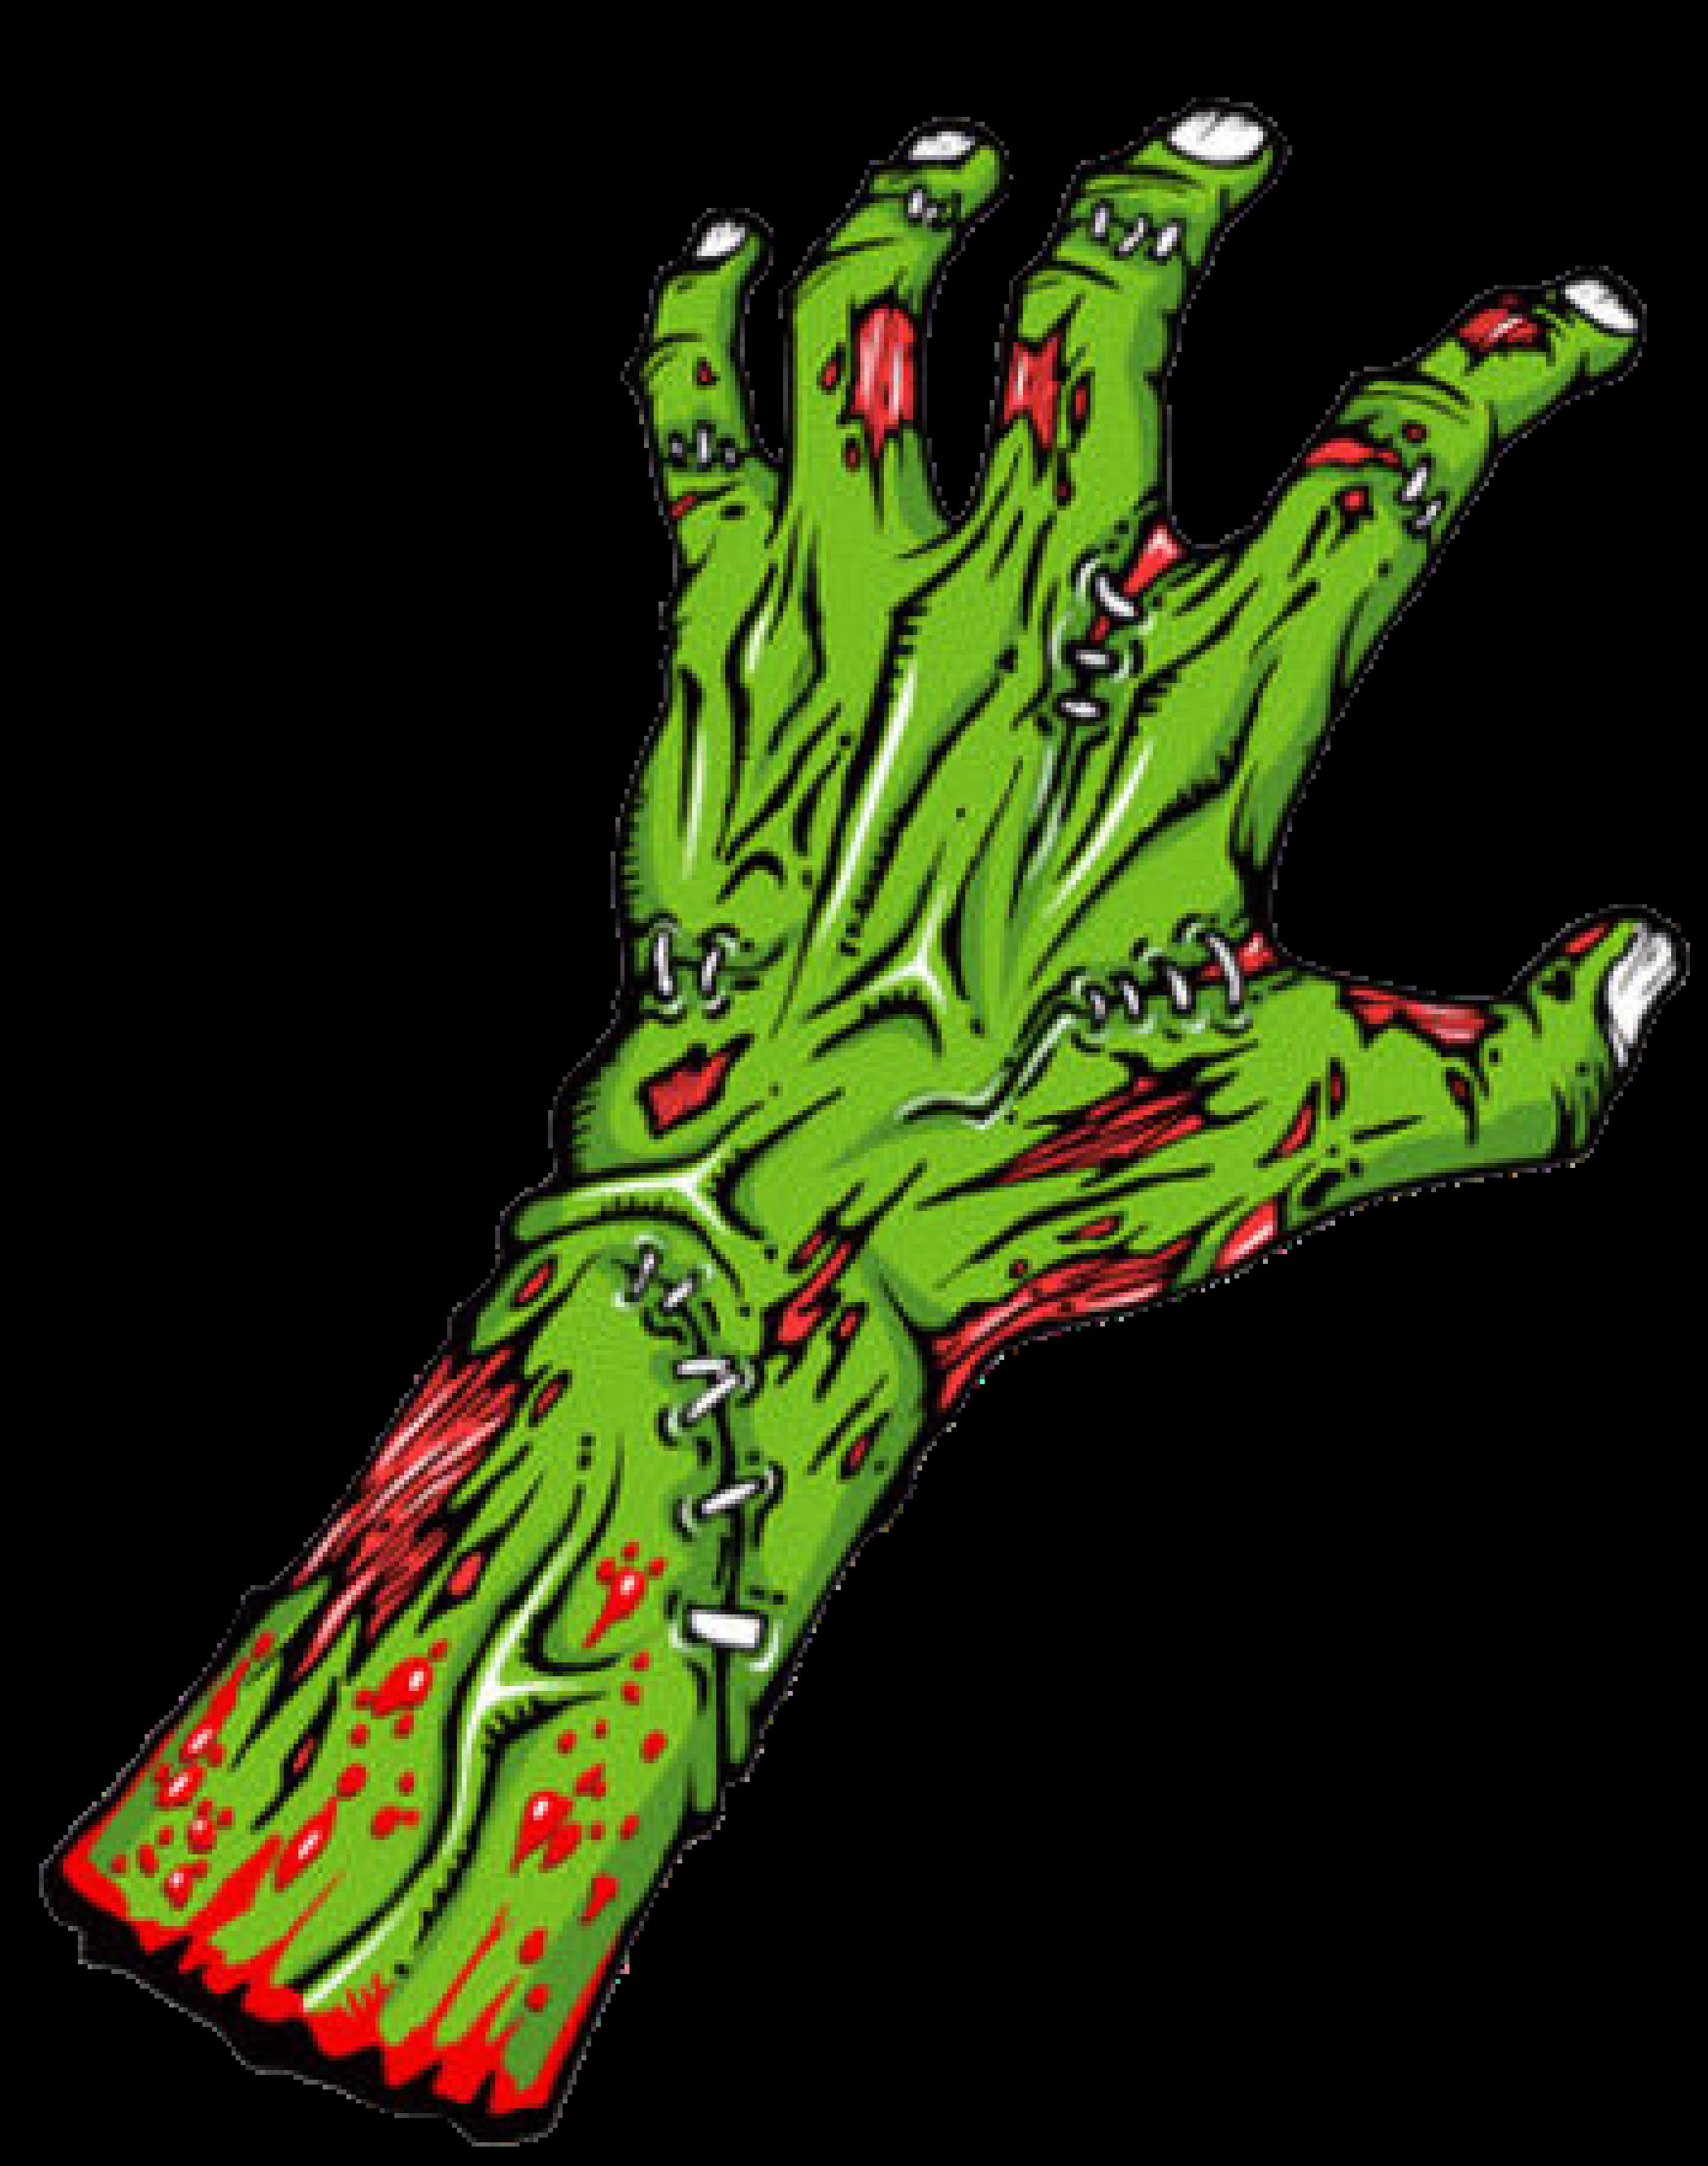 2456x3114 15 Handprint Drawing Zombie For Free Download On Mbtskoudsalg